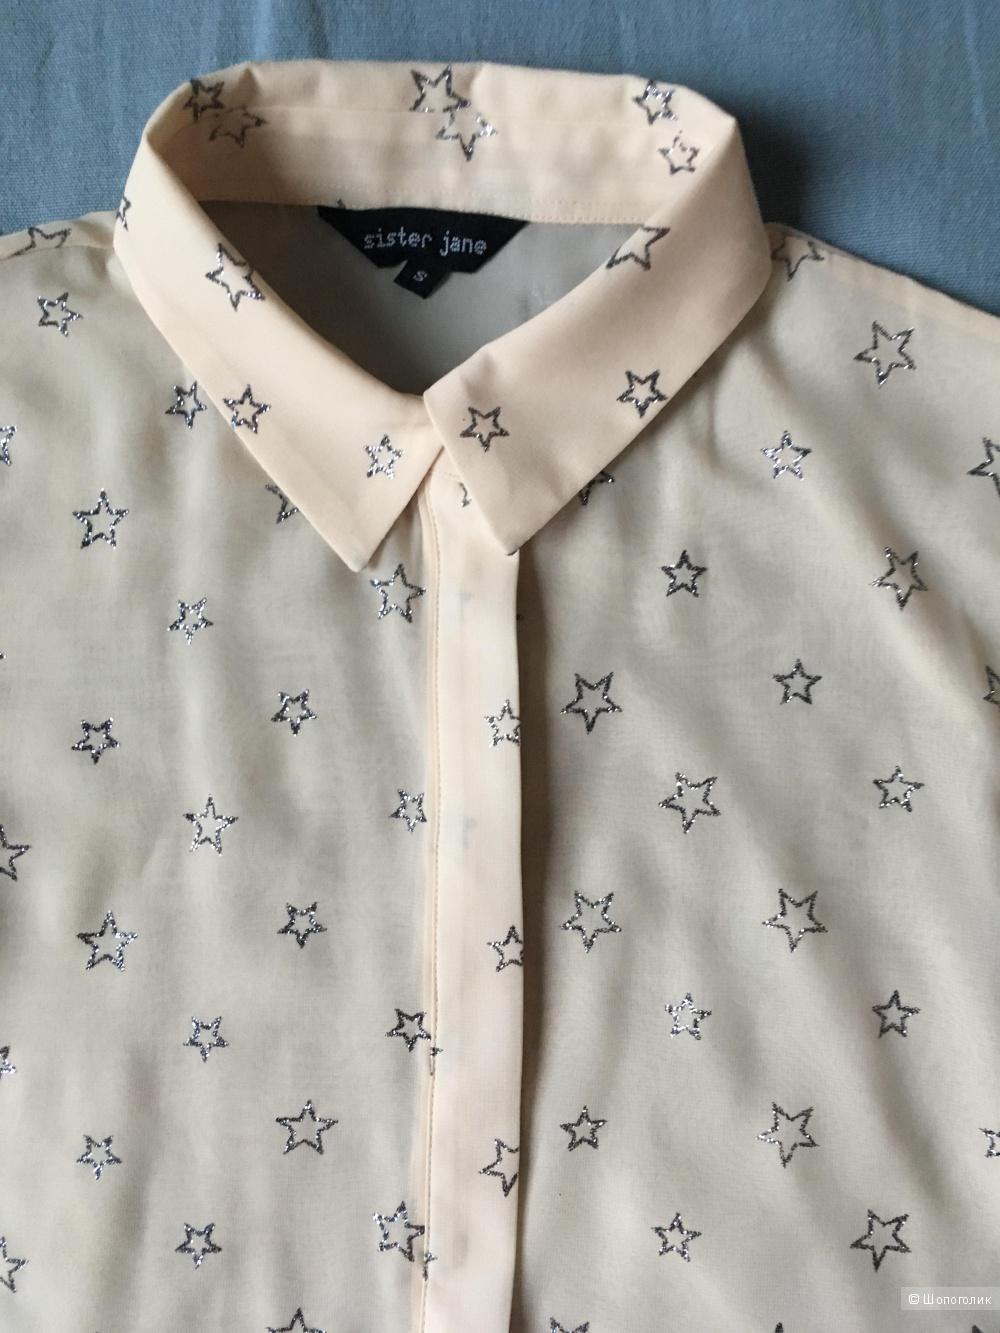 Рубашка Sister Jane XS-S с блестящими звёздами